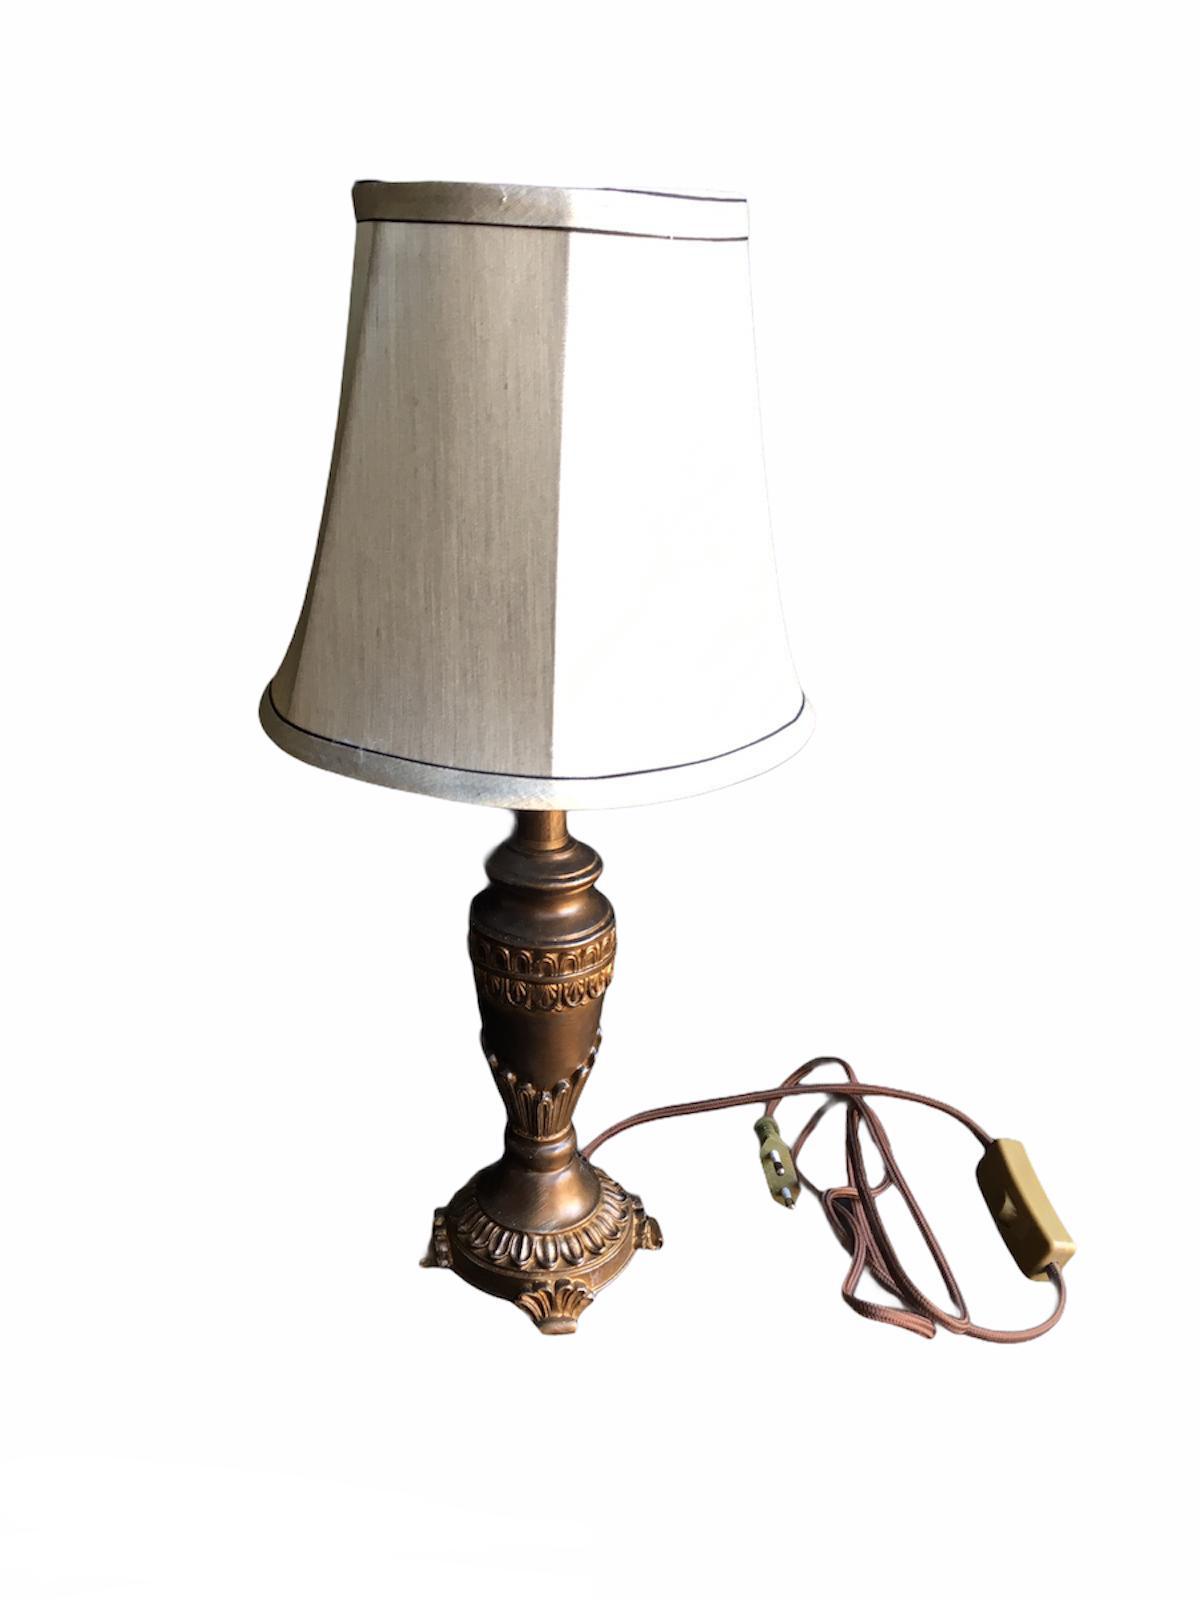 Galda lampa Настольная лампа Table lamp